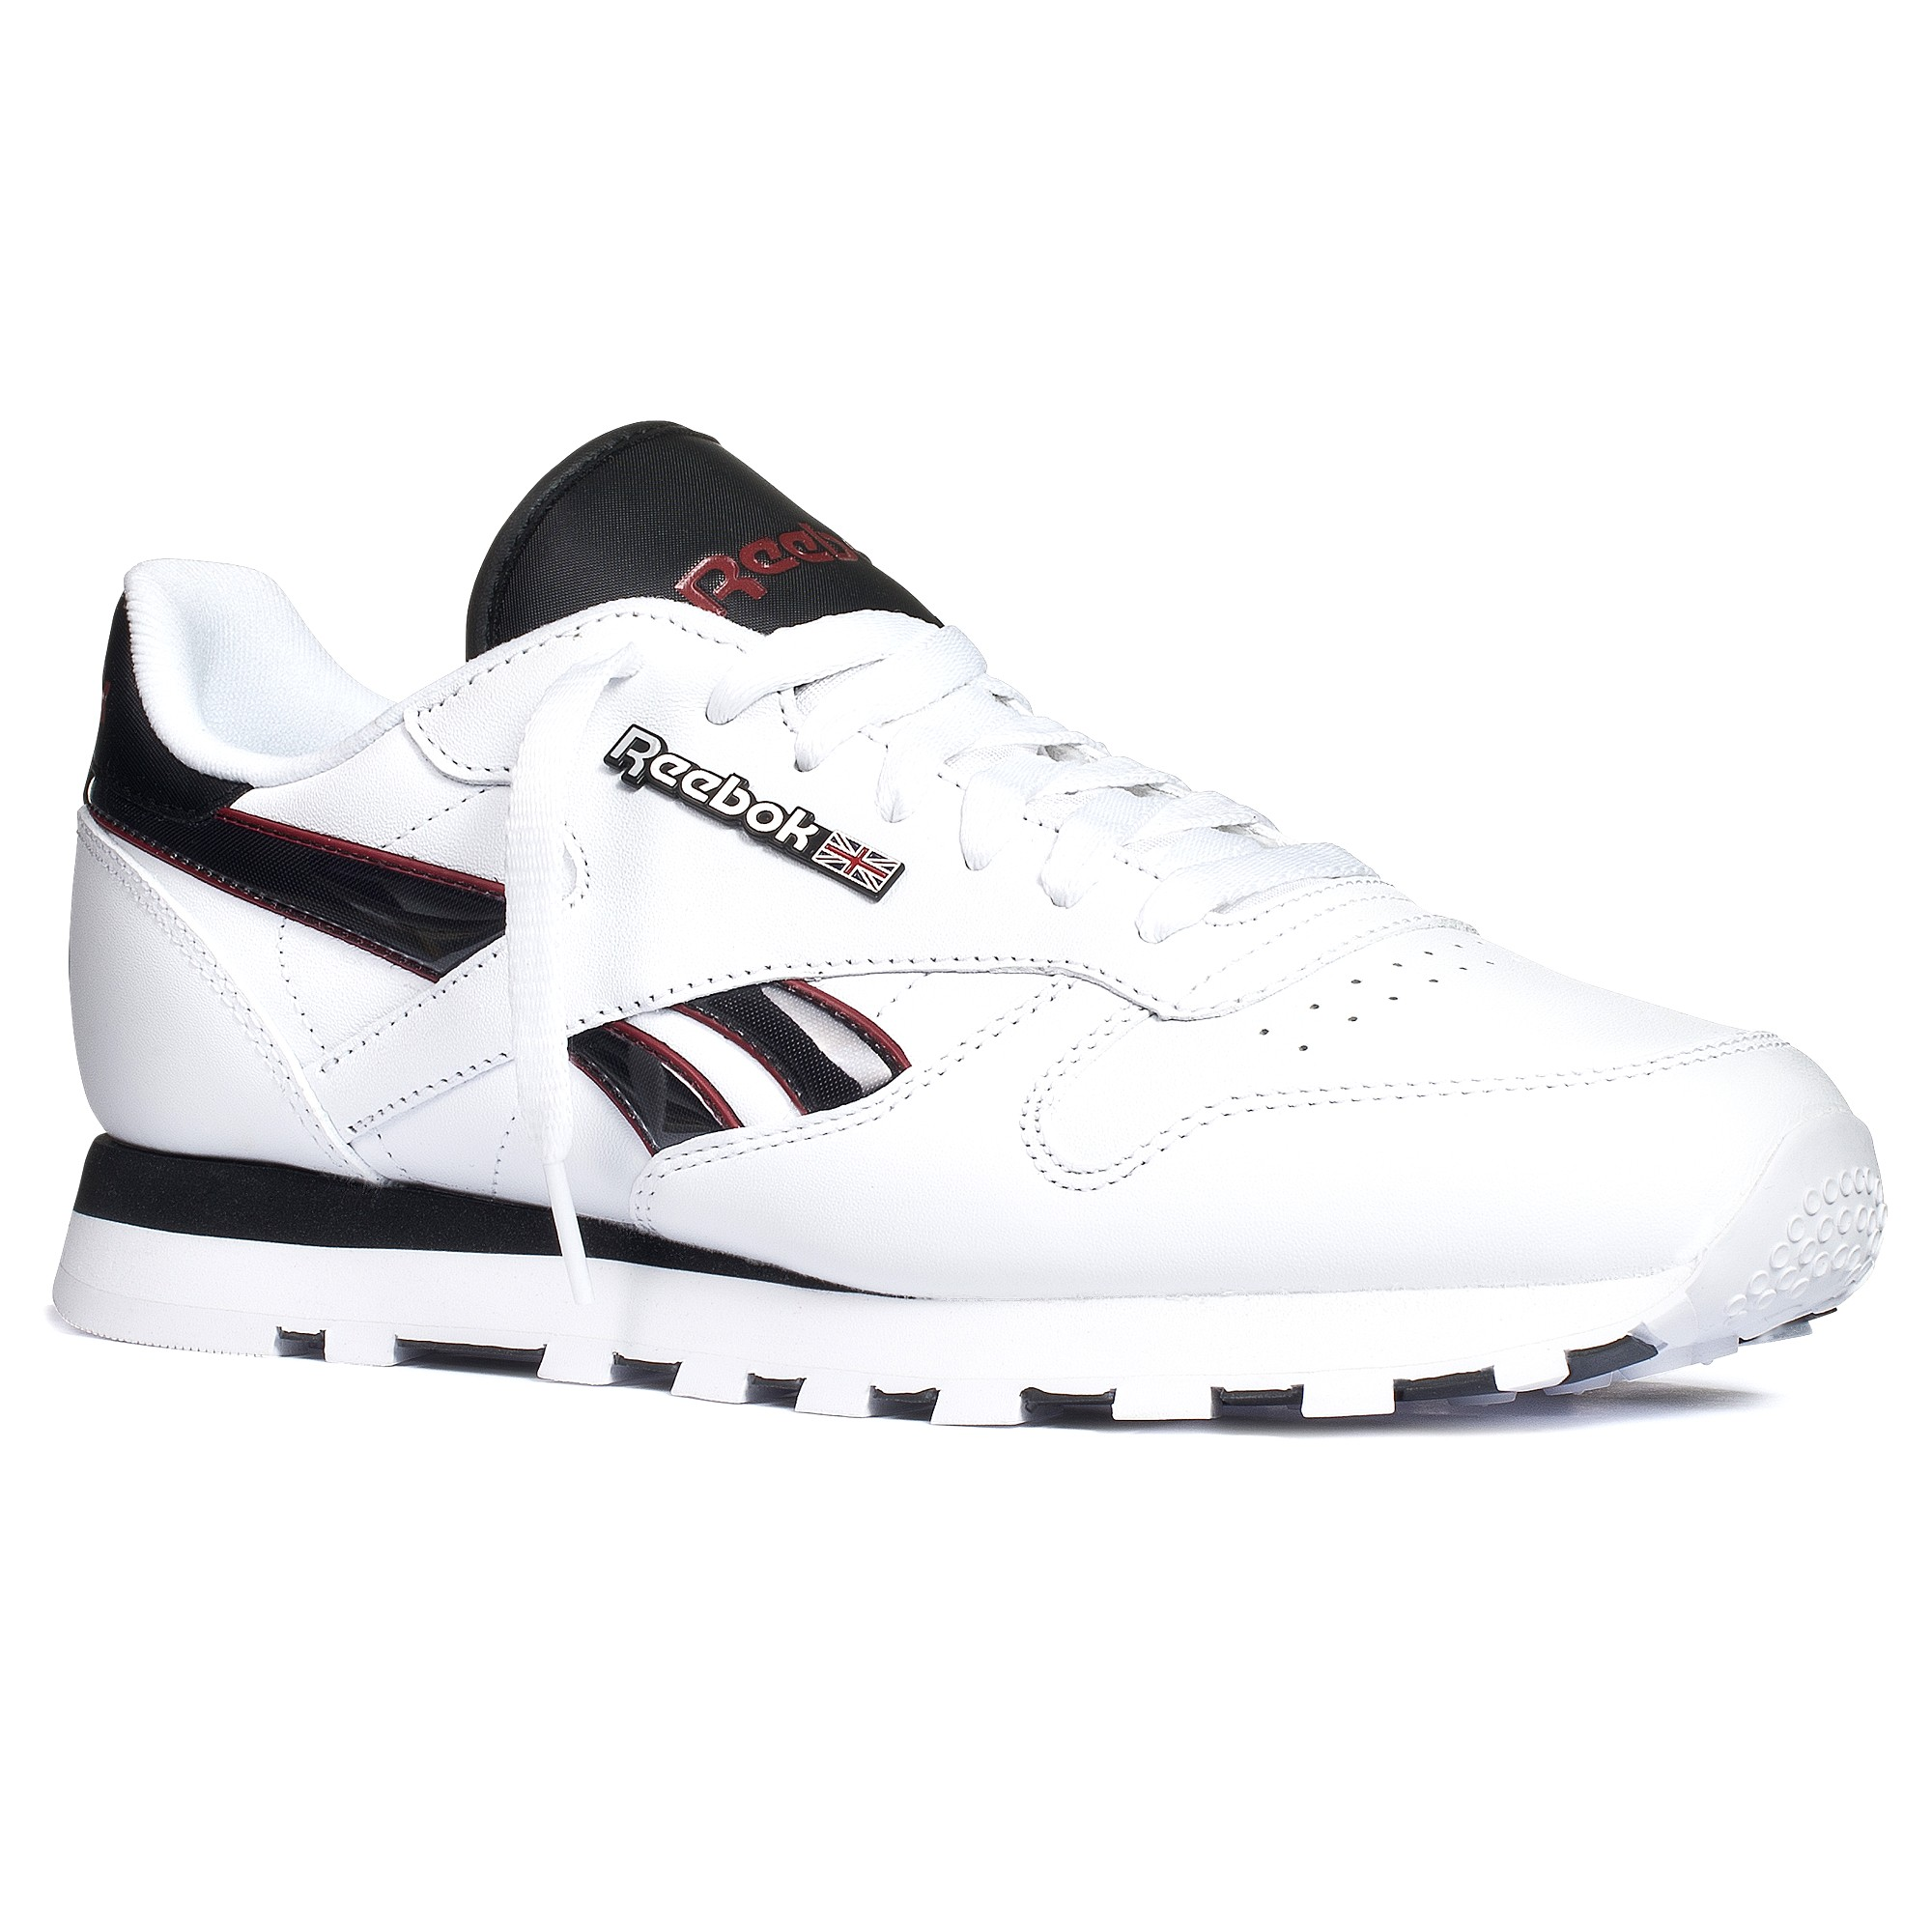 Sneaker Tech Mtl Leder Ausnahme Reebok Cl Schuhe Classic Leather tqYOa